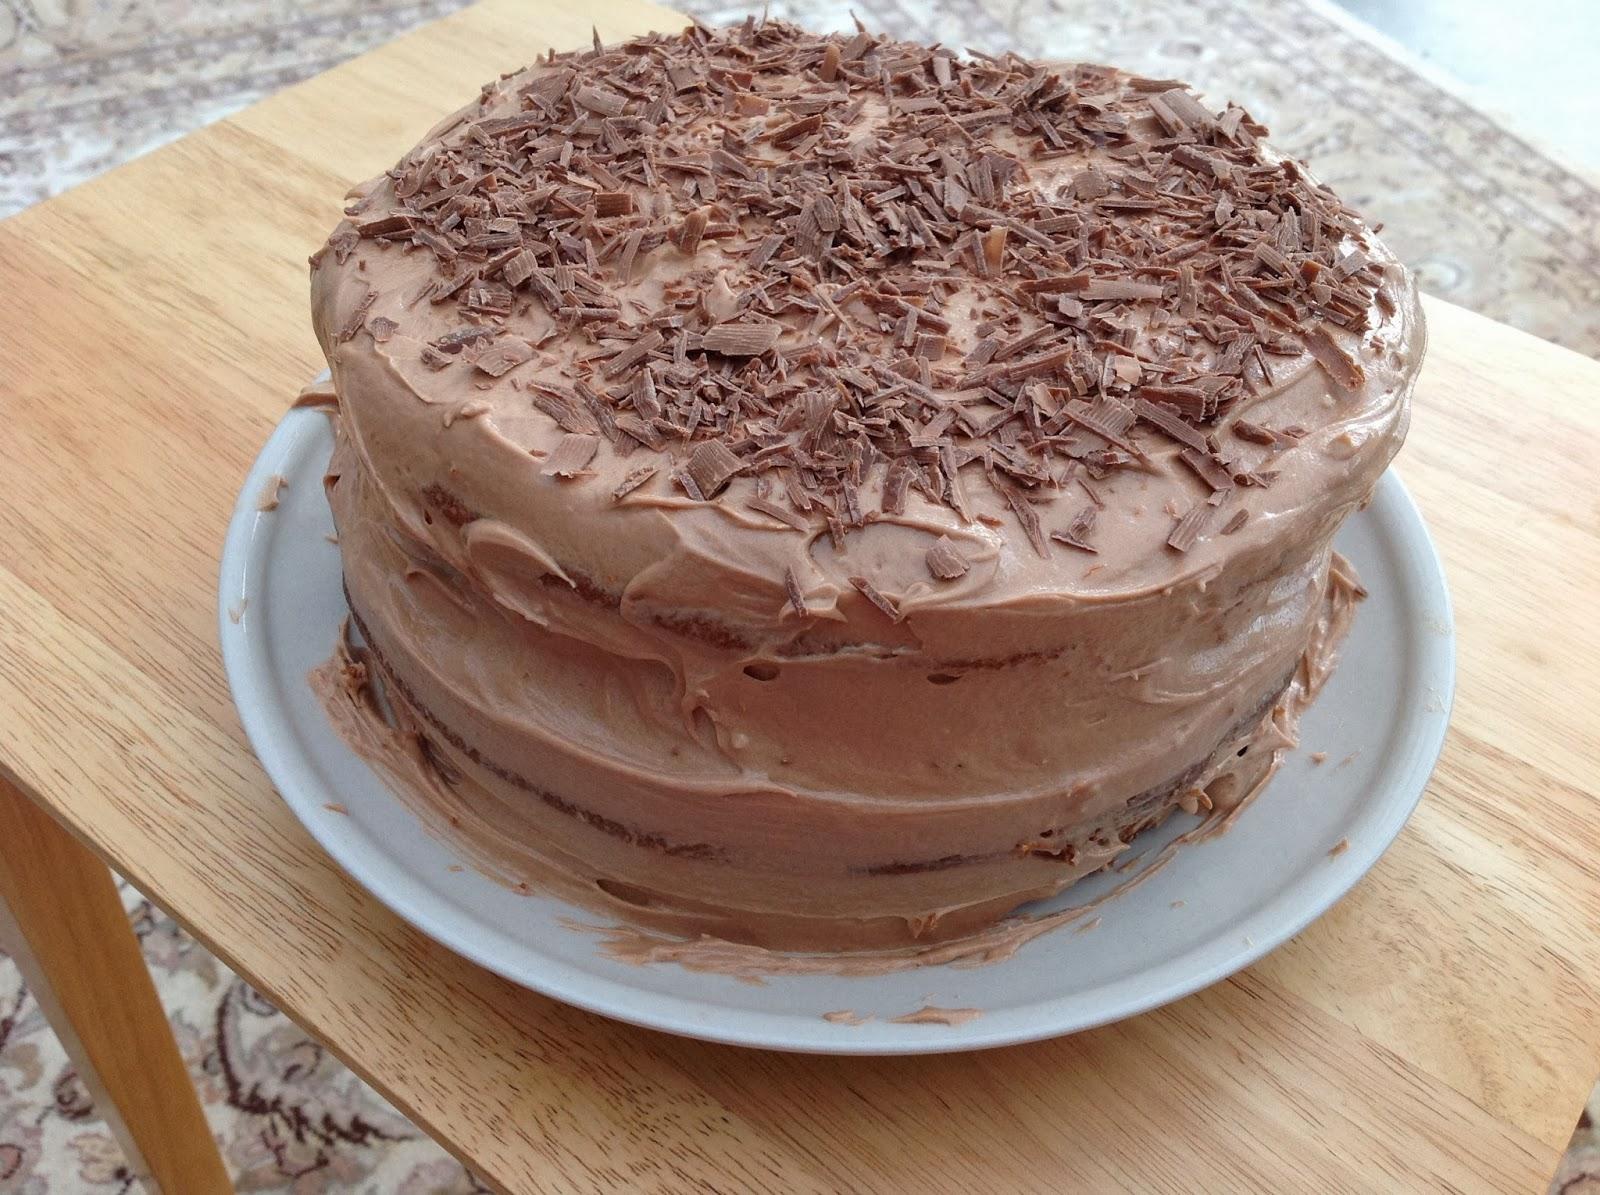 This Muslim Girl Bakes: Cinnamon Cake with Chocolate Orange Icing